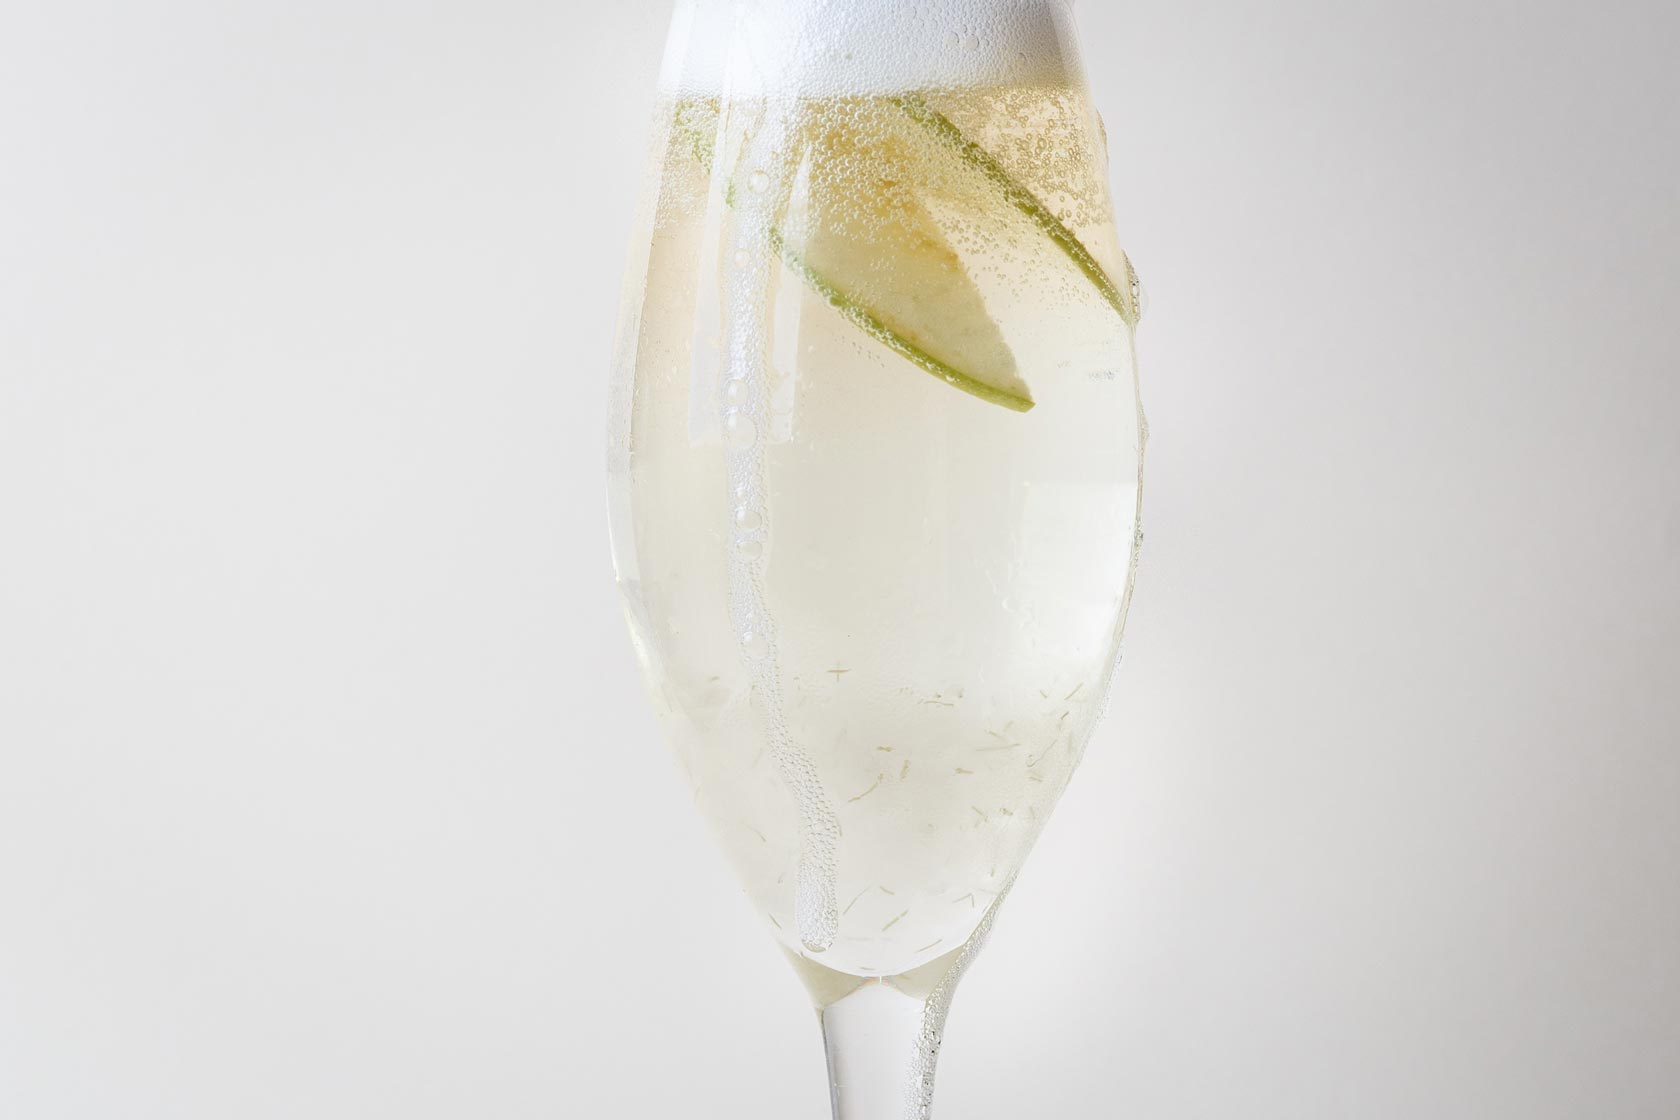 Champagne-cocktail-1680.jpg